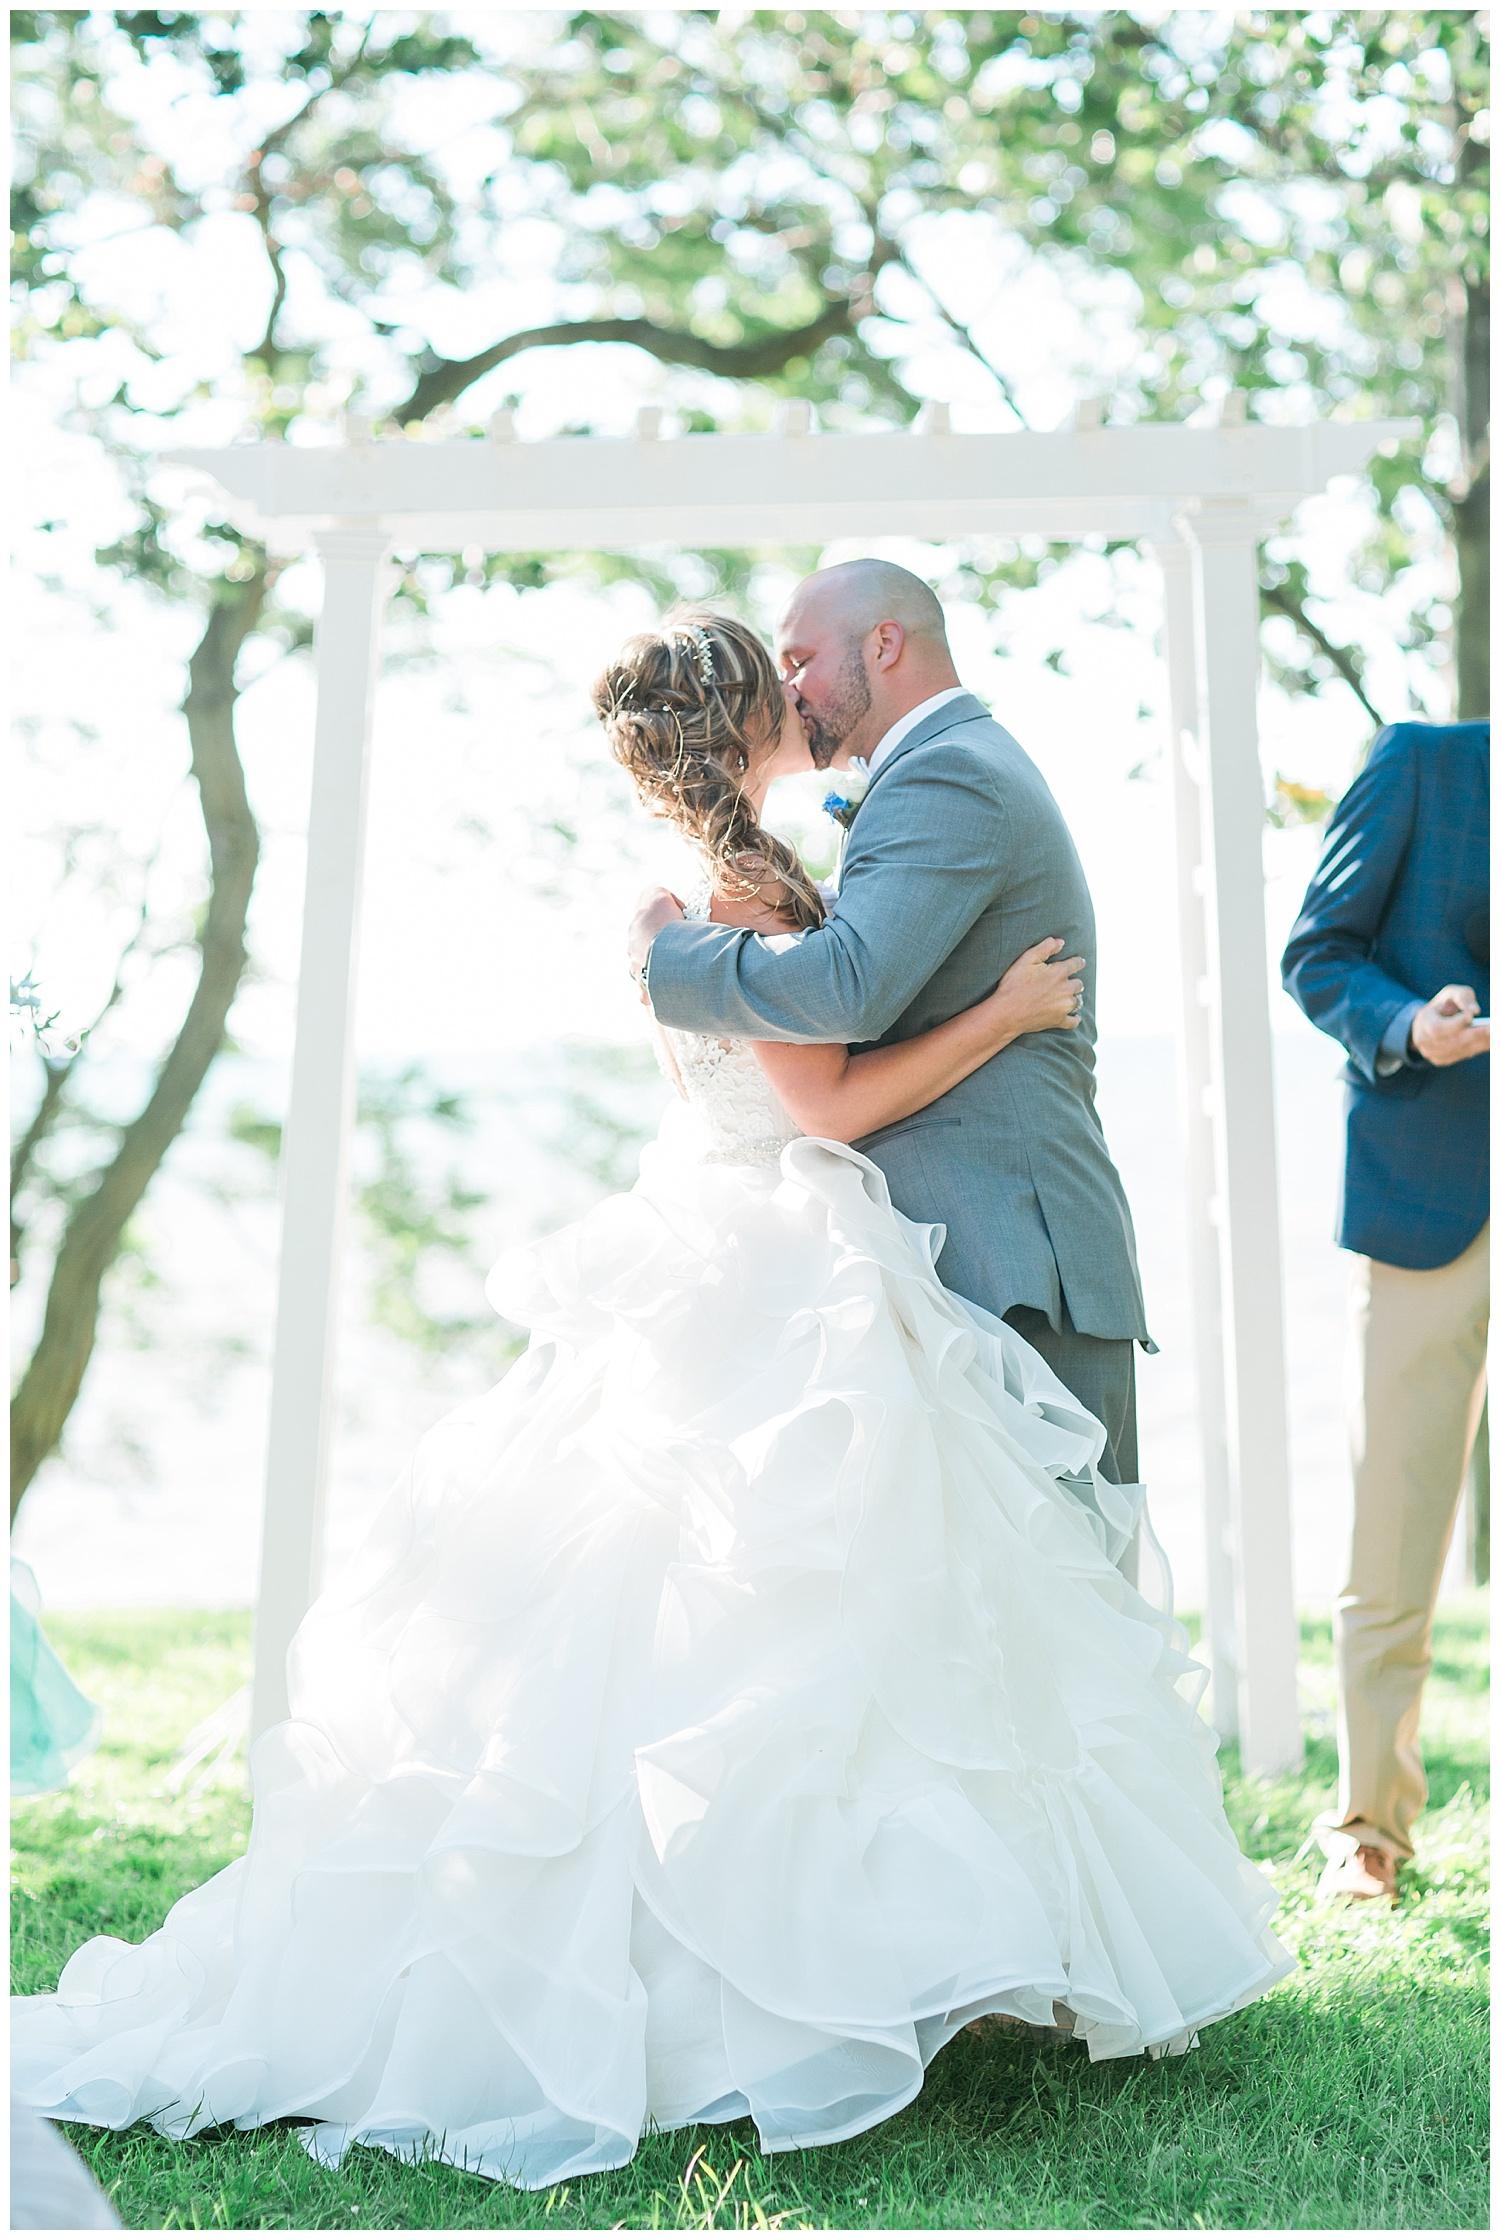 Sean and Andrea - Webster wedding - lass and beau-740_Buffalo wedding photography.jpg